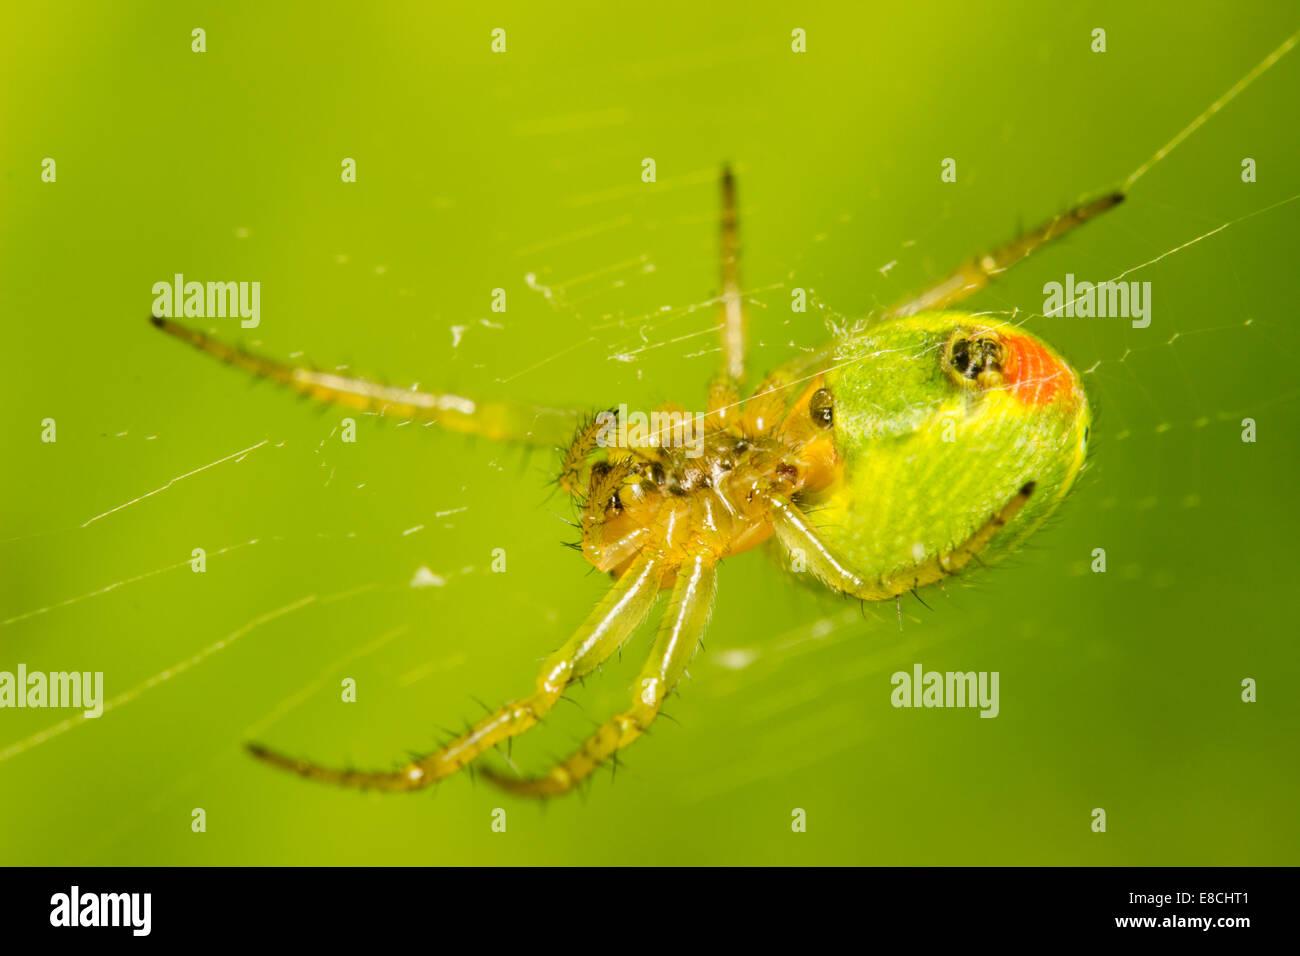 Female Araniella cucurbitina, a small, green orb web garden spider - Stock Image